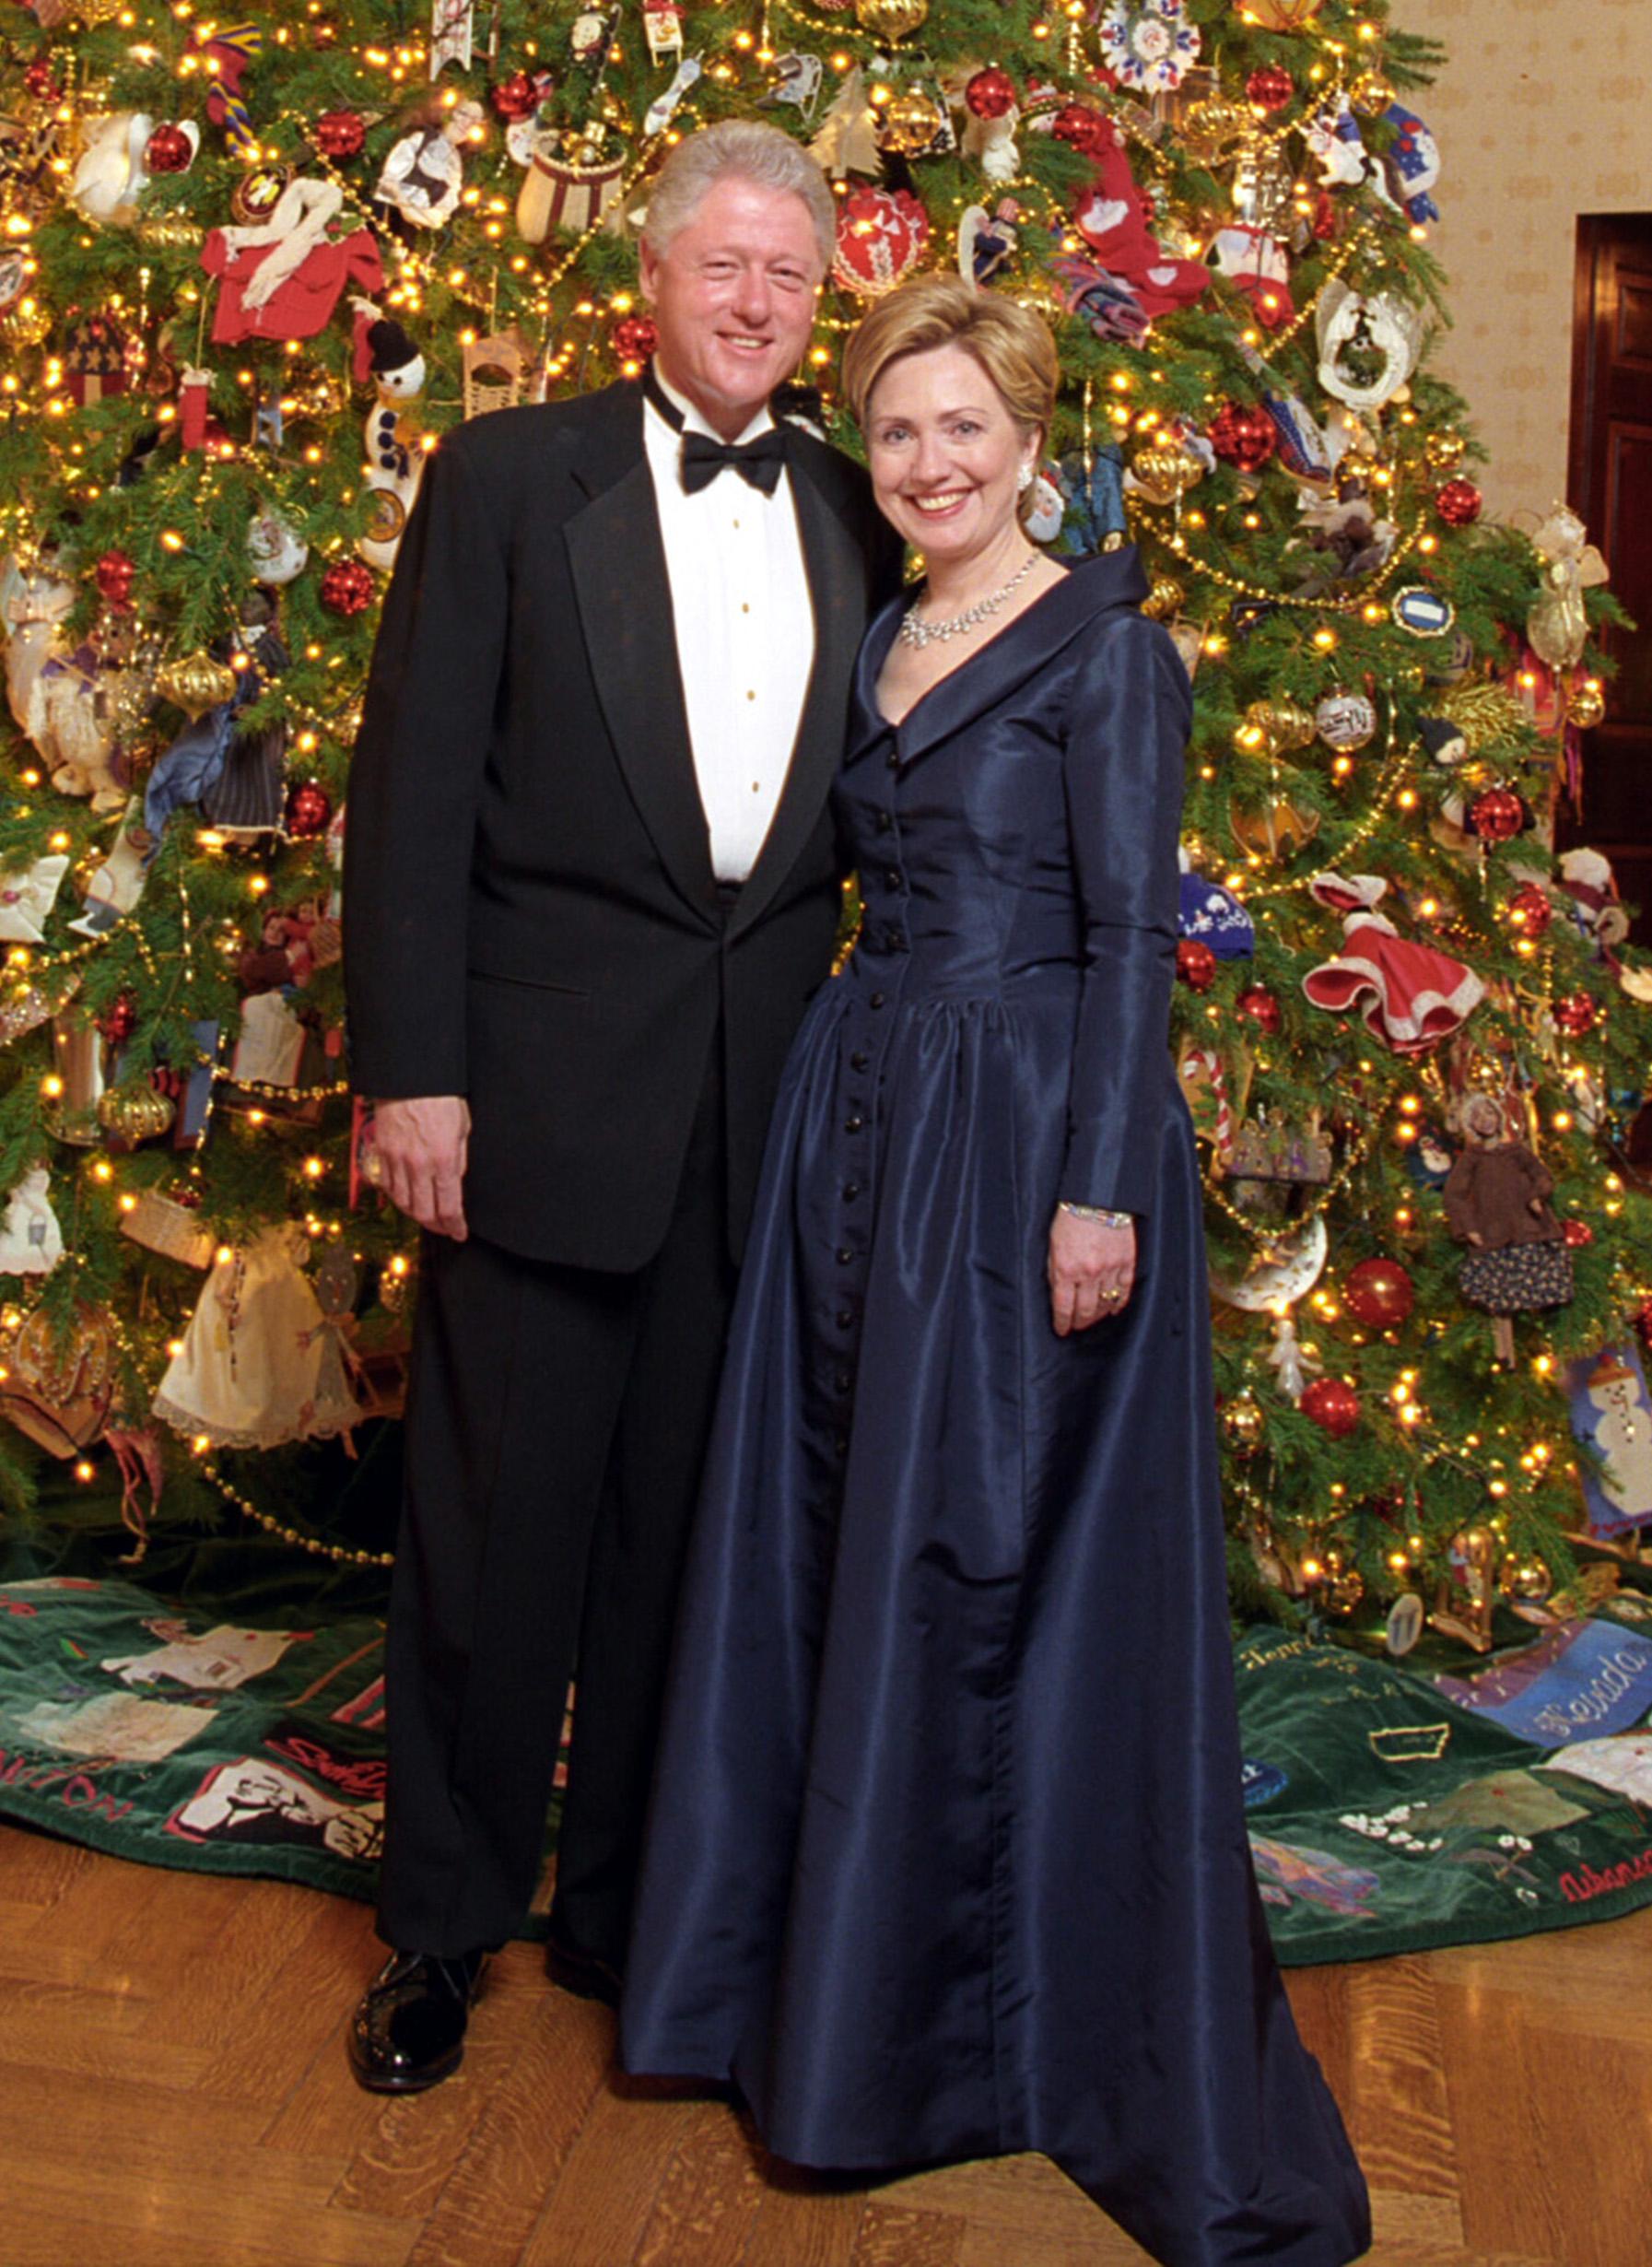 Hillary Clinton Christmas.File Bill And Hillary Clinton Christmas Portrait 2000 Cropped1 Jpg